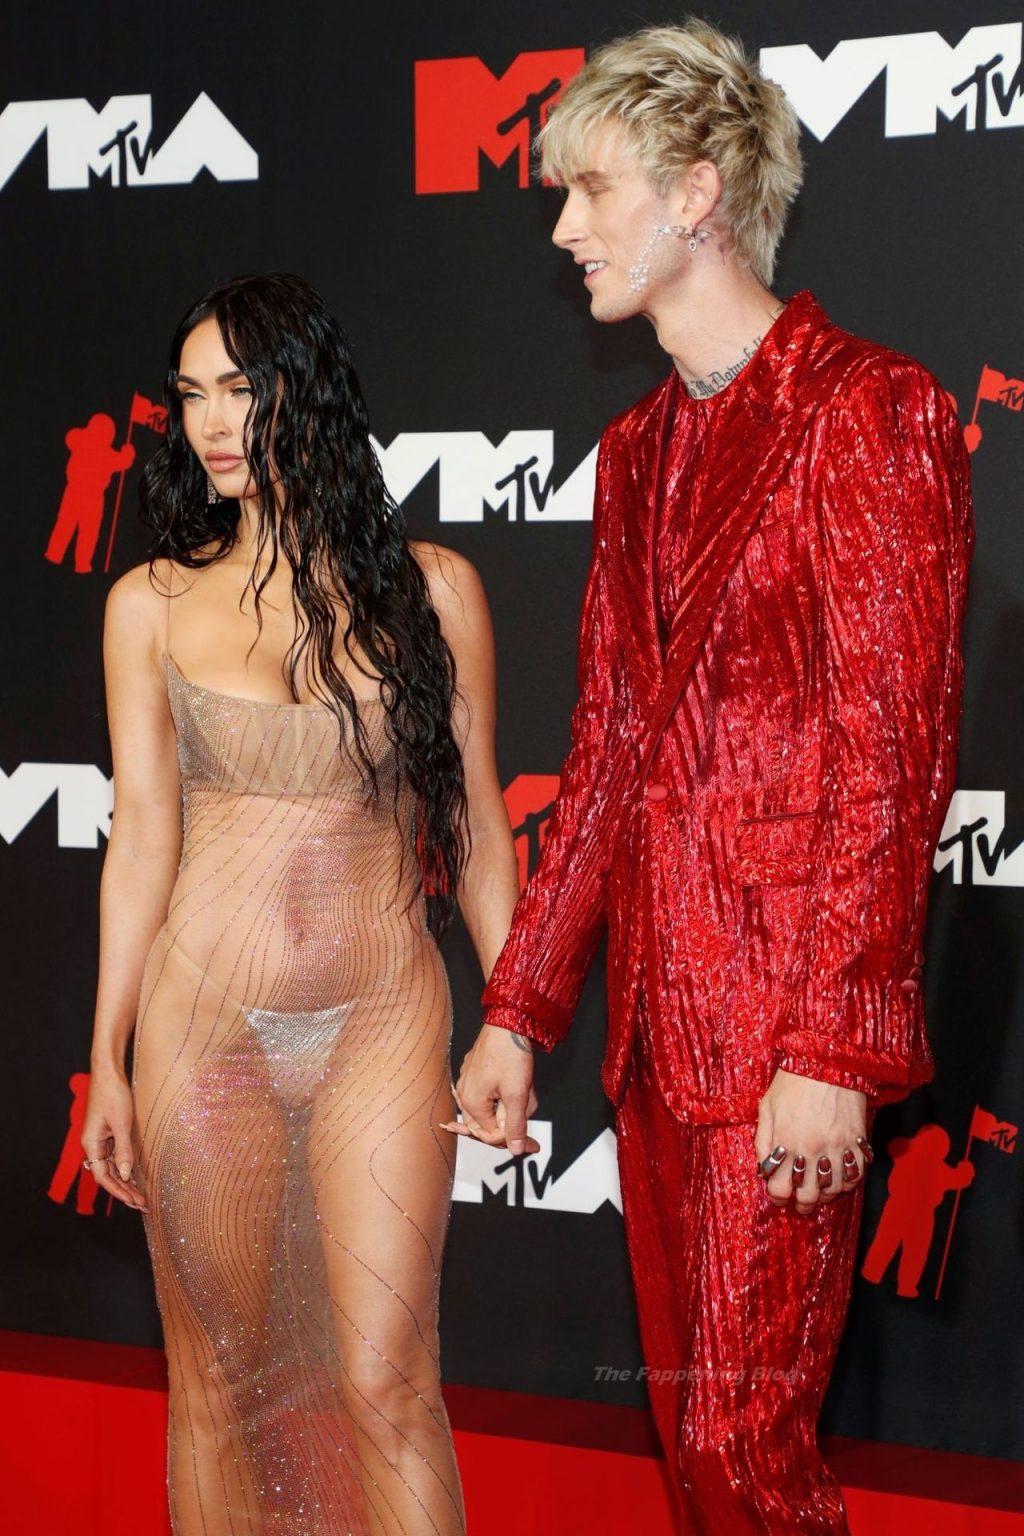 Megan Fox Looks Hot at the 2021 MTV Video Music Awards (133 Photos)